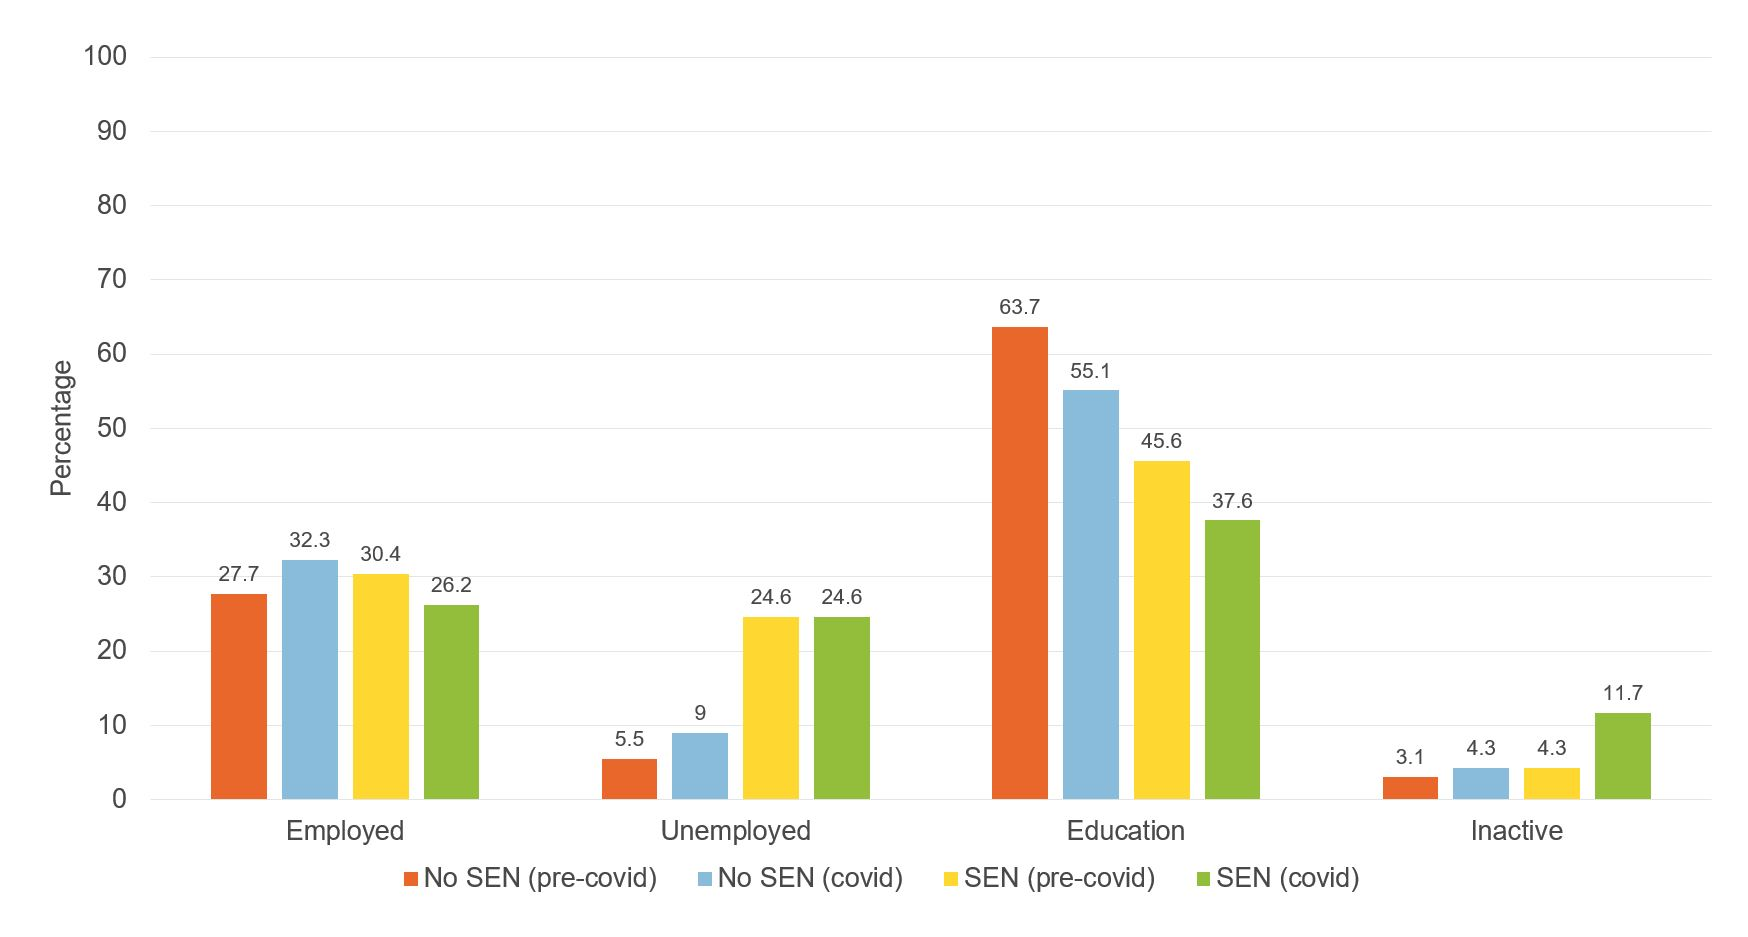 Figure showing economic activity by SEN status (aged around 19)